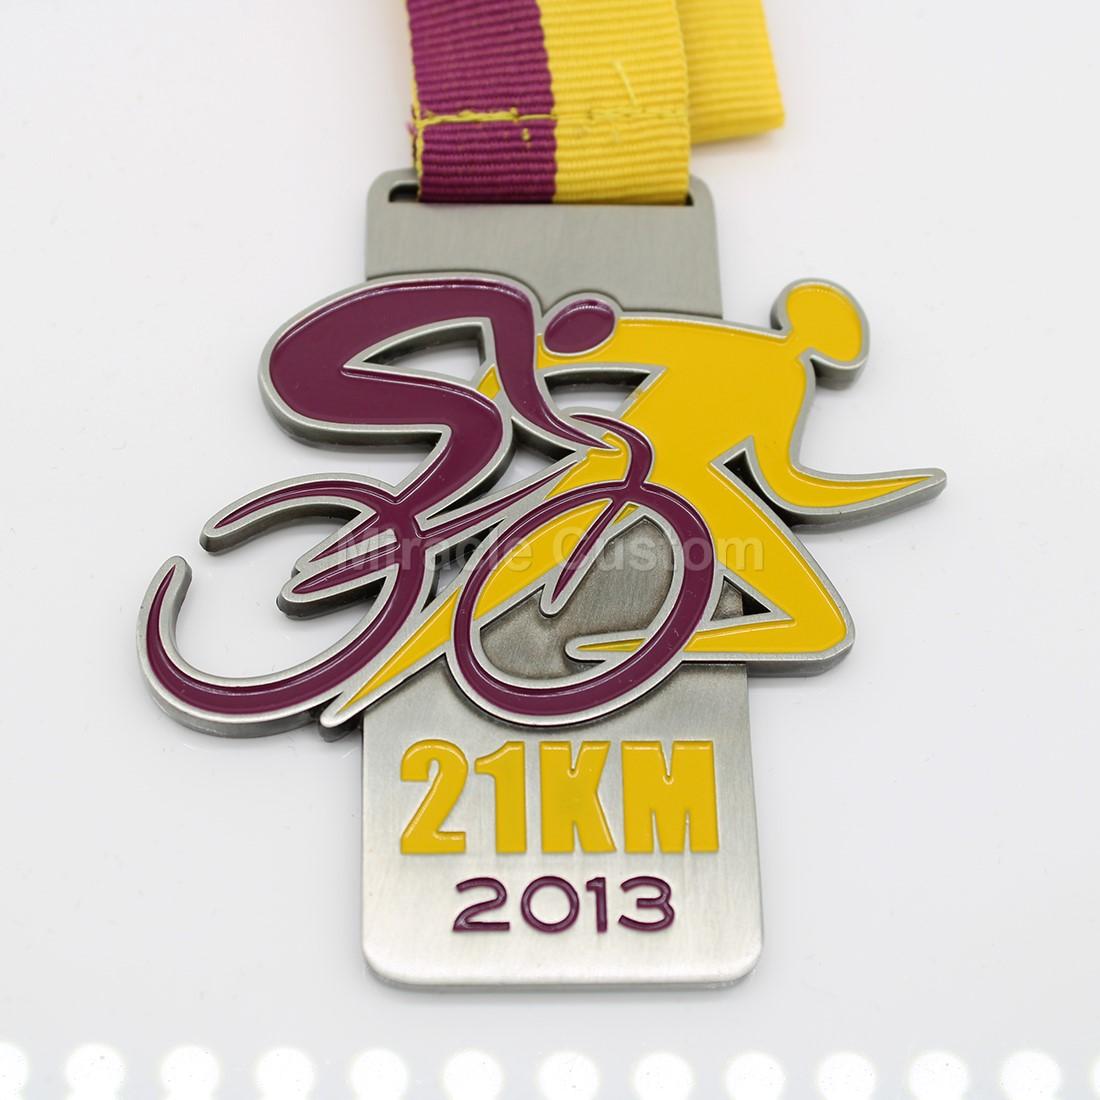 Custom 42KM Finisher Medals